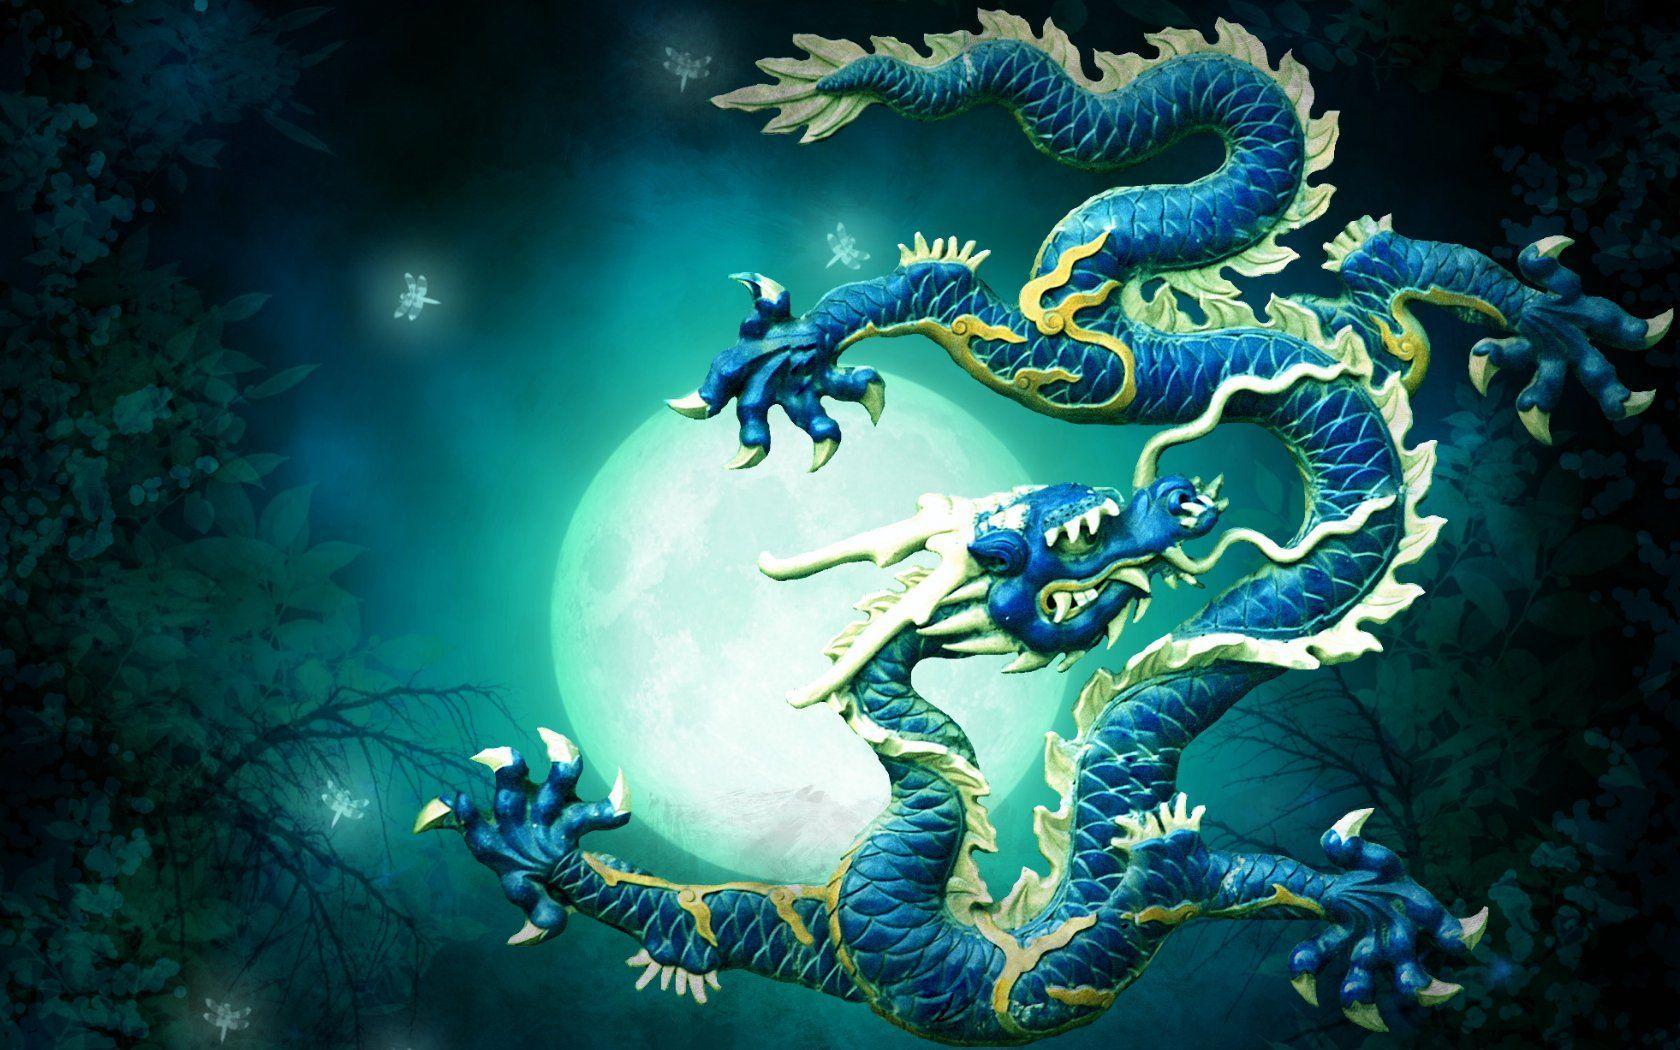 Blue and gold dragons fantasy dragons den pokemon shiny gold sigma